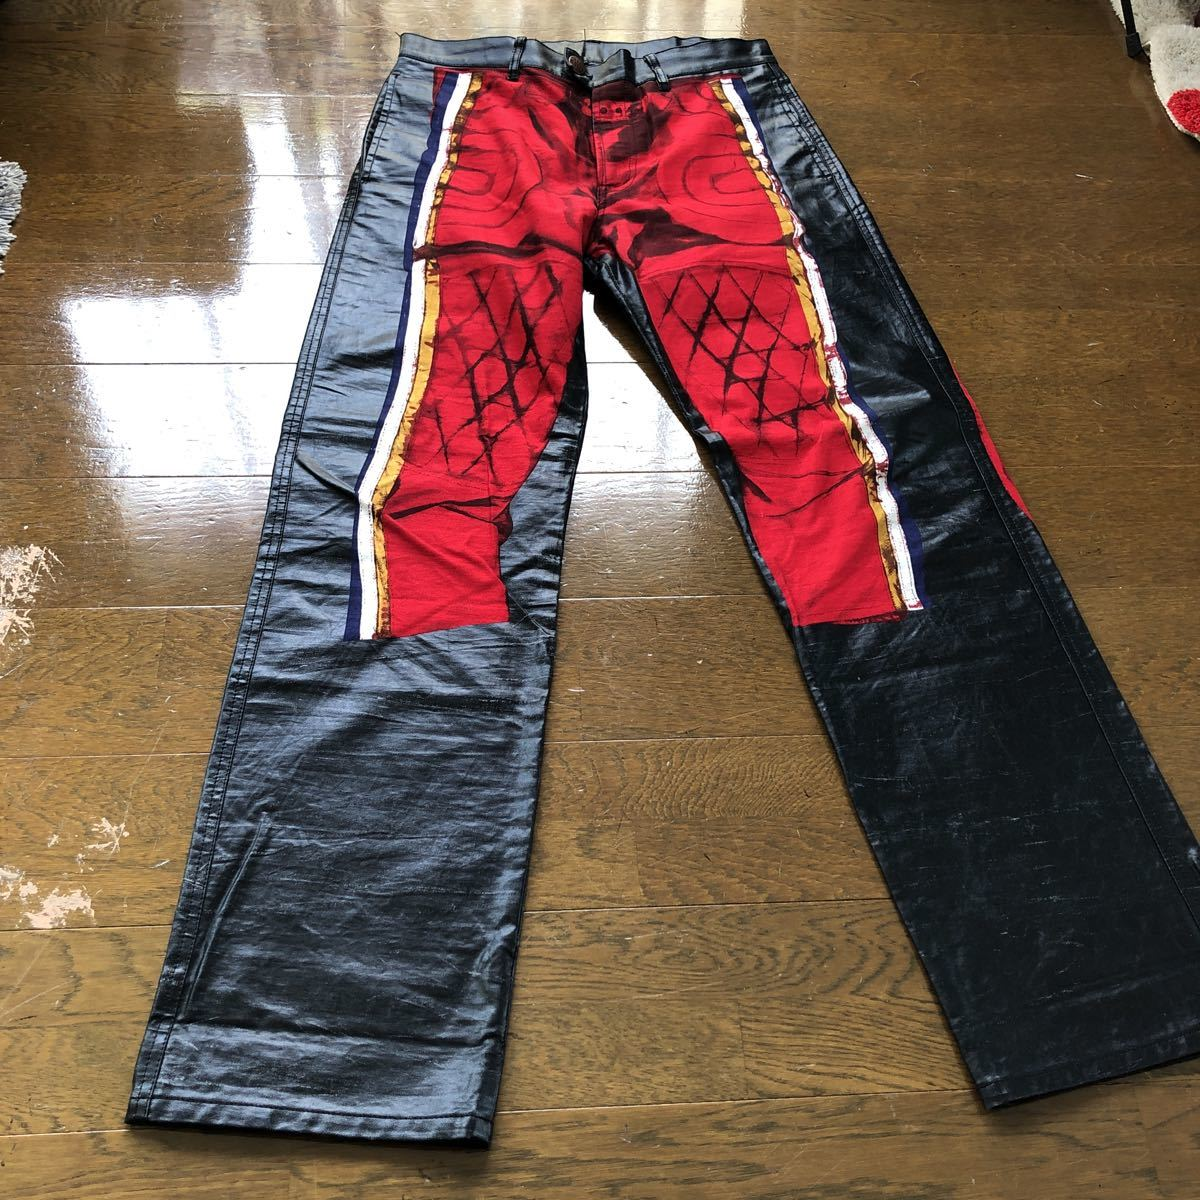 Jean Paul GAULTIER ジャンポールゴルチエ gaultier jeans ゴルチエジーンズ パンツ